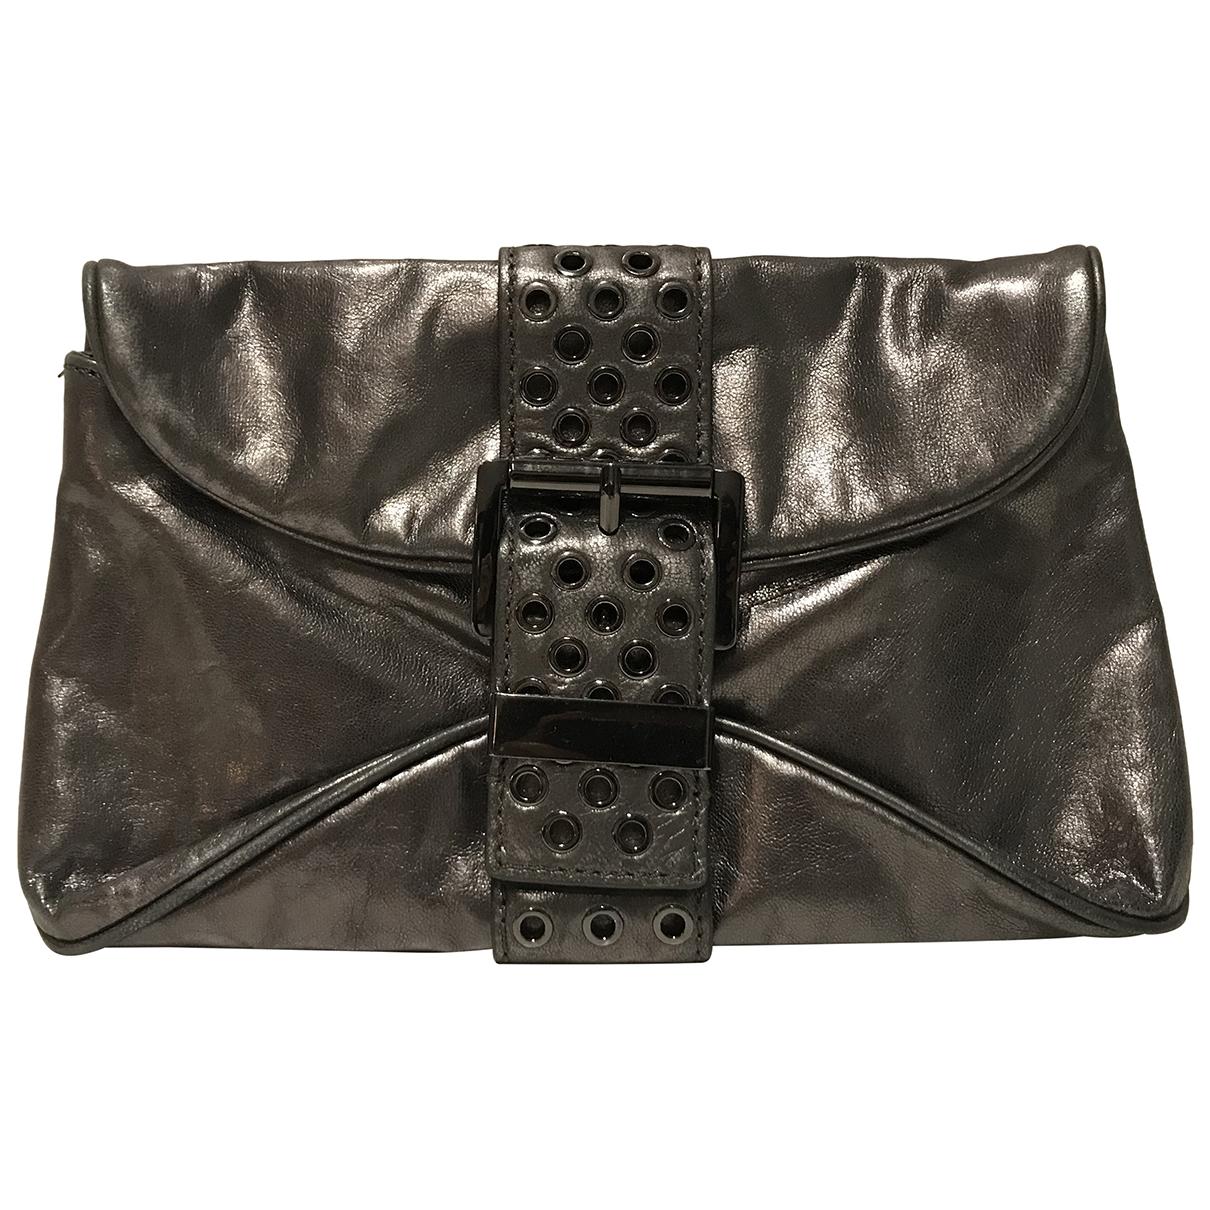 Michael Kors \N Metallic Leather Clutch bag for Women \N